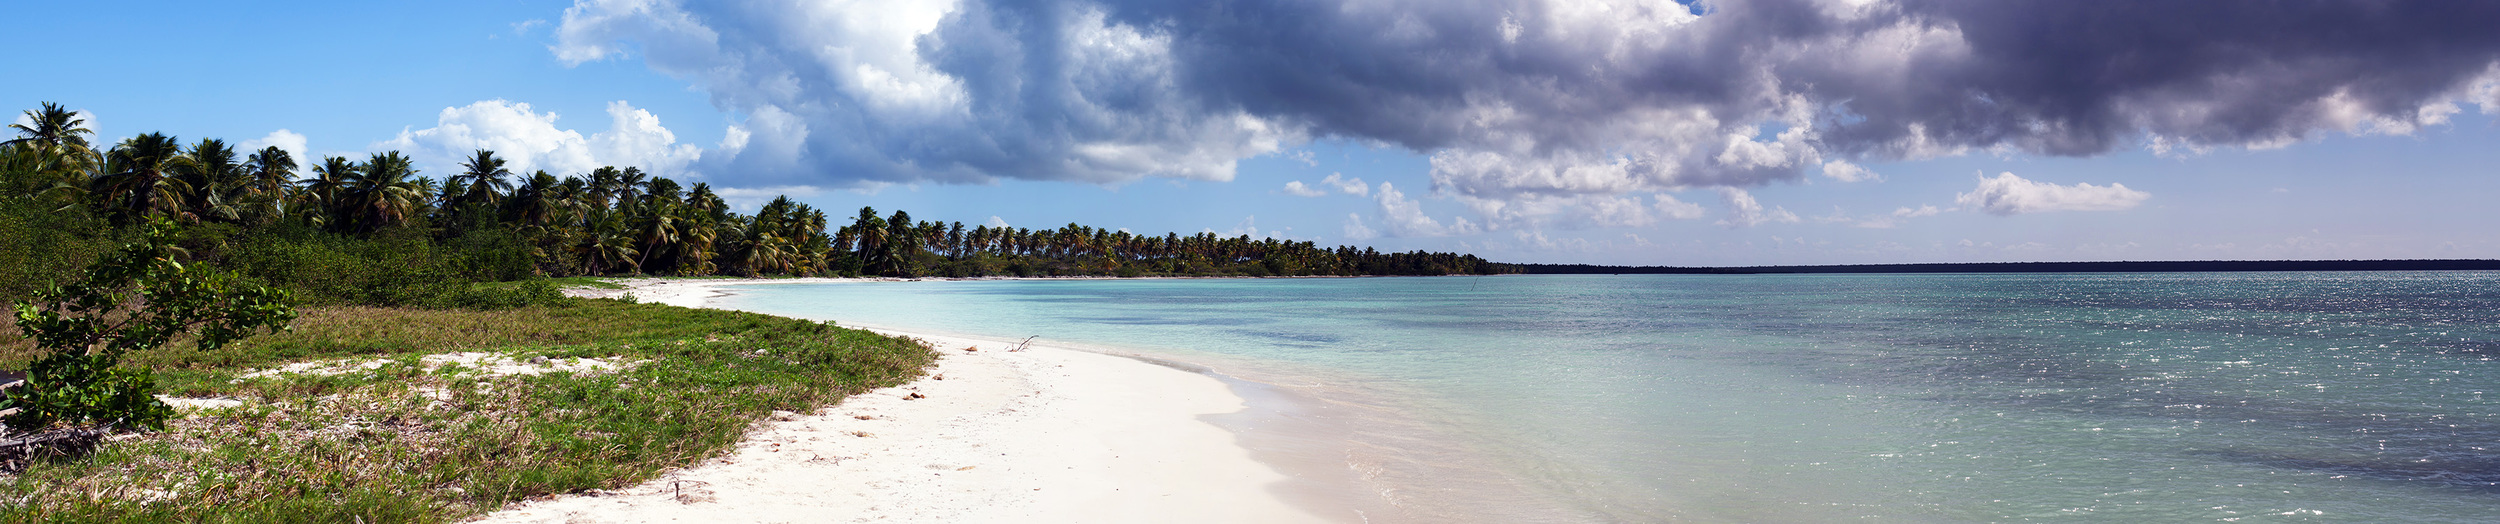 Beach at Saona Island, DR